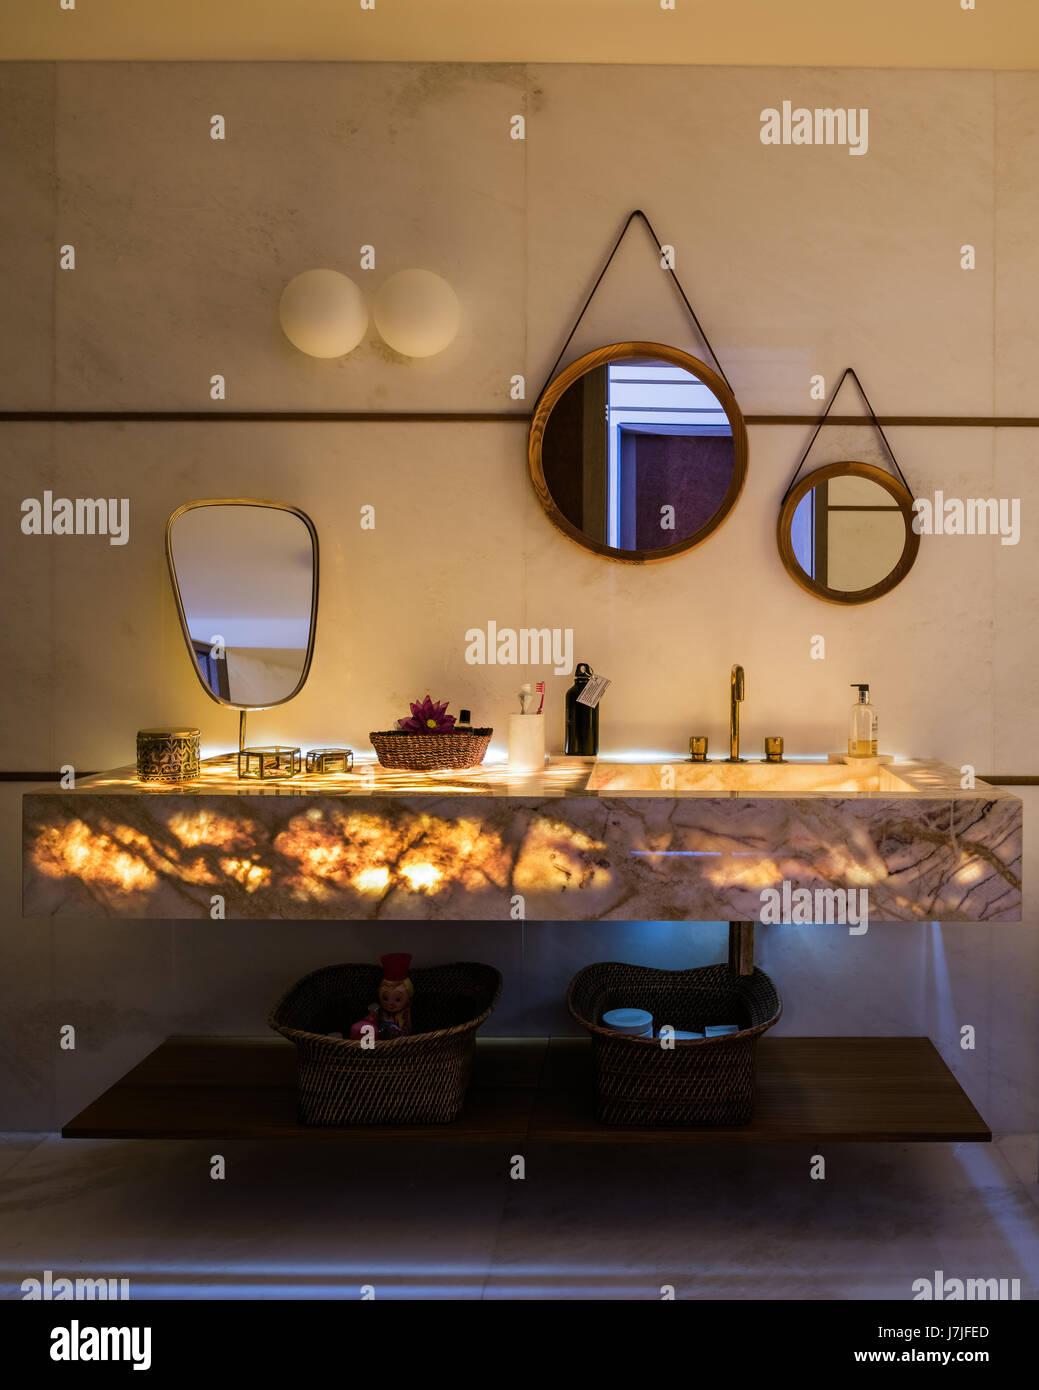 Sule Arinc Stockfotos & Sule Arinc Bilder - Alamy